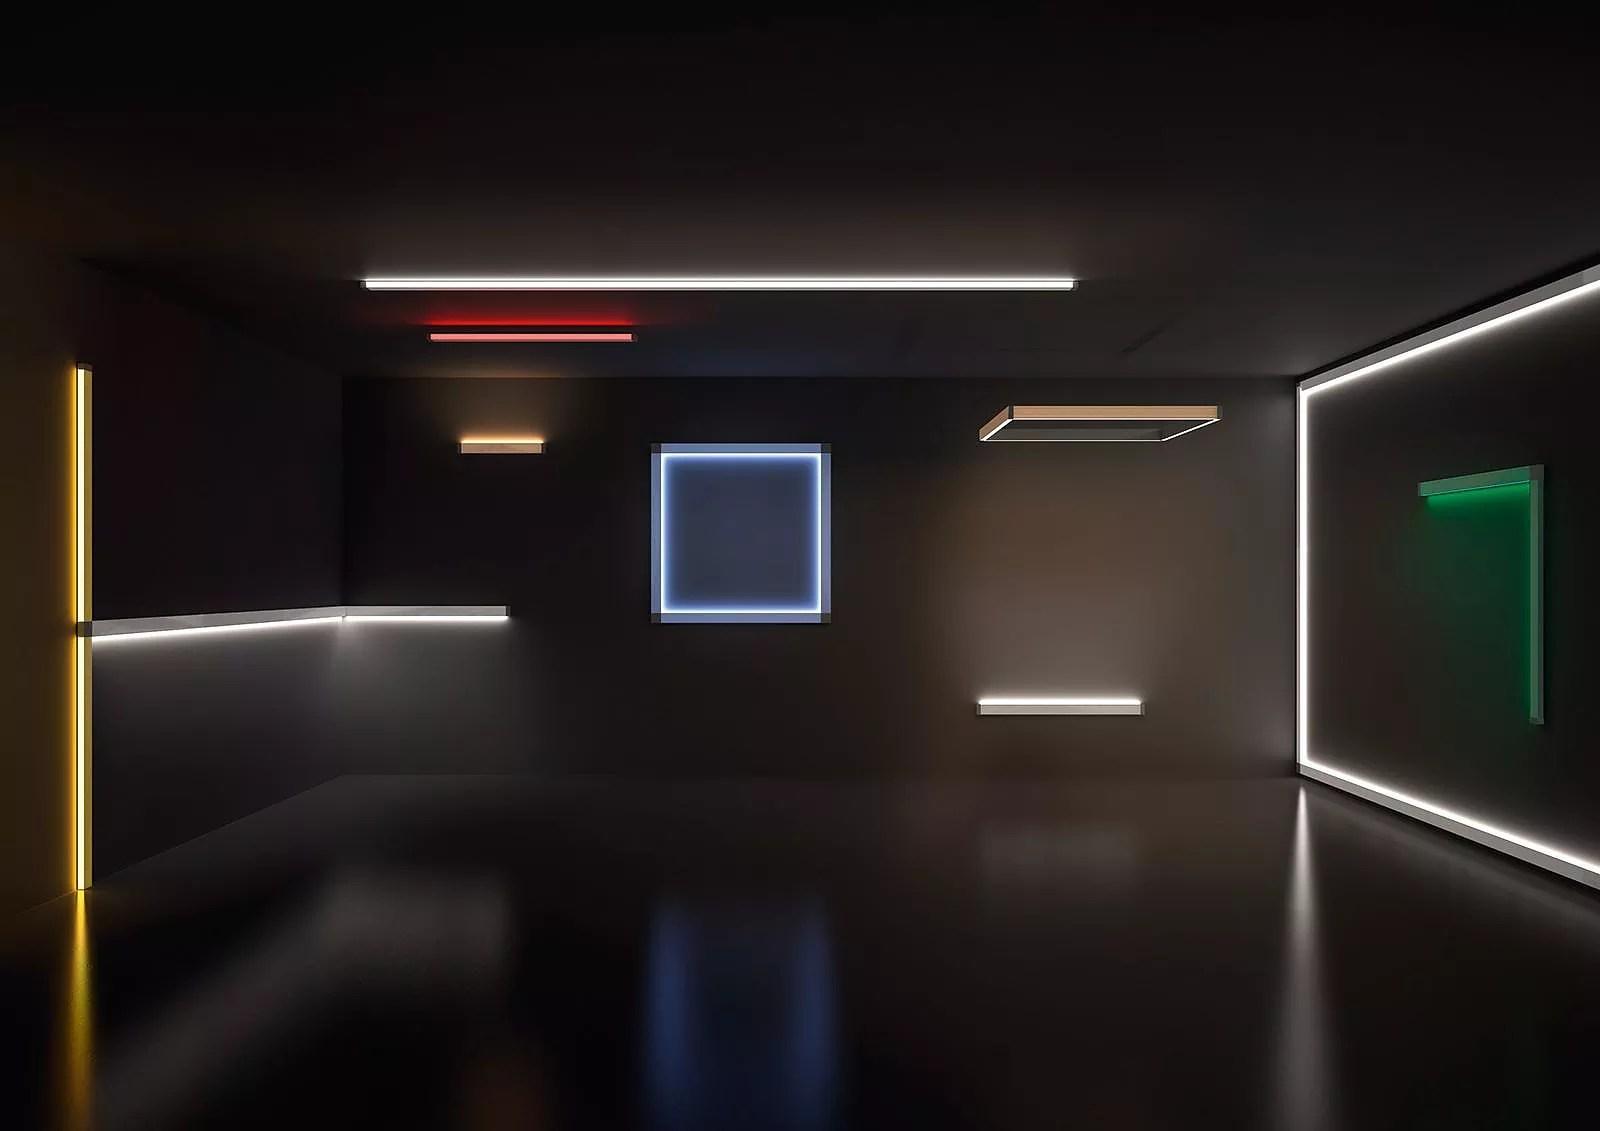 Multicolor Led Light